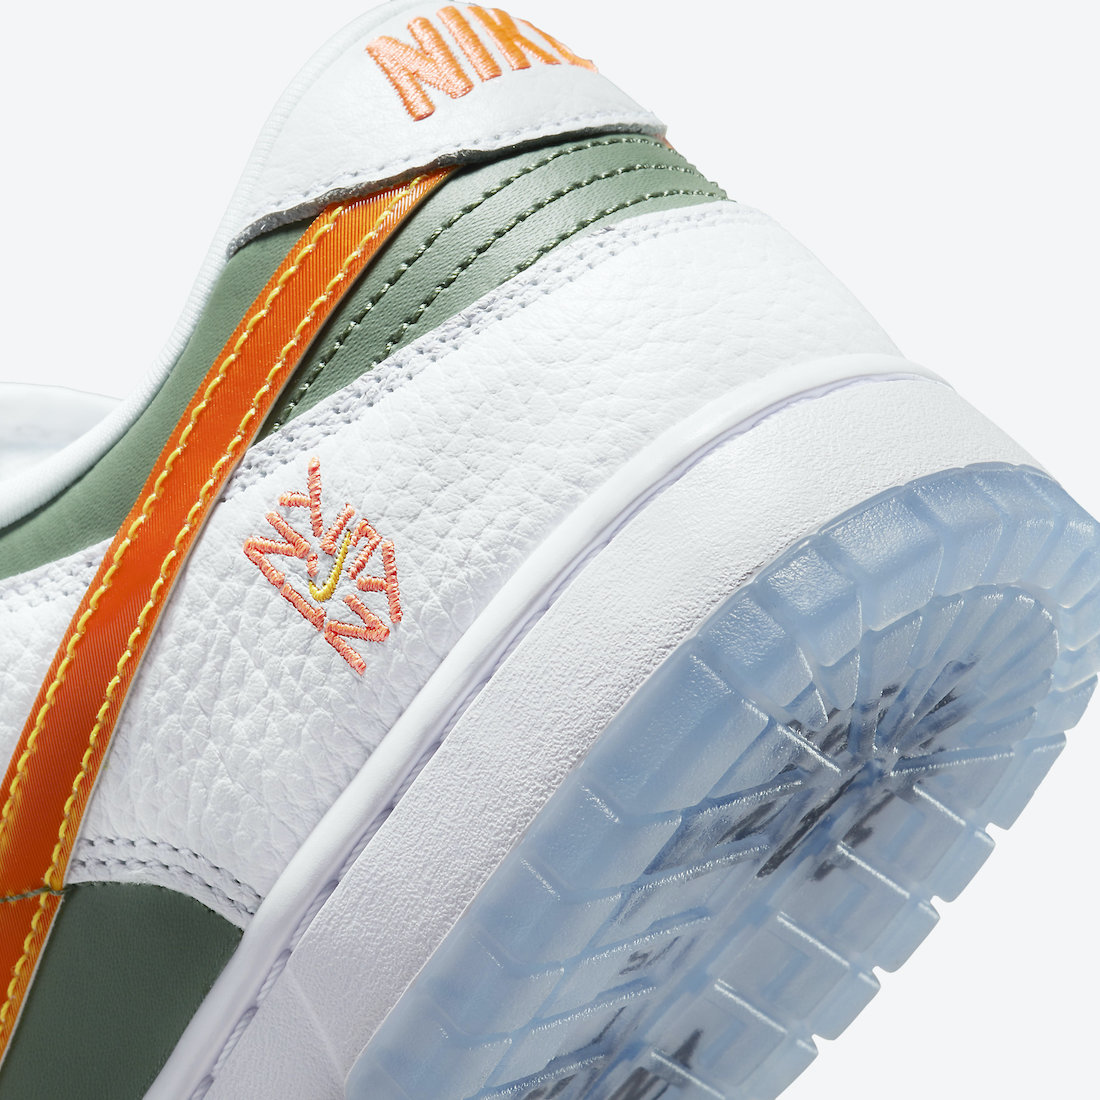 Nike,Dunk Low,NY vs NY,DN2489-  酷似「佳得乐」配色!全新 Dunk Low 发售信息曝光!